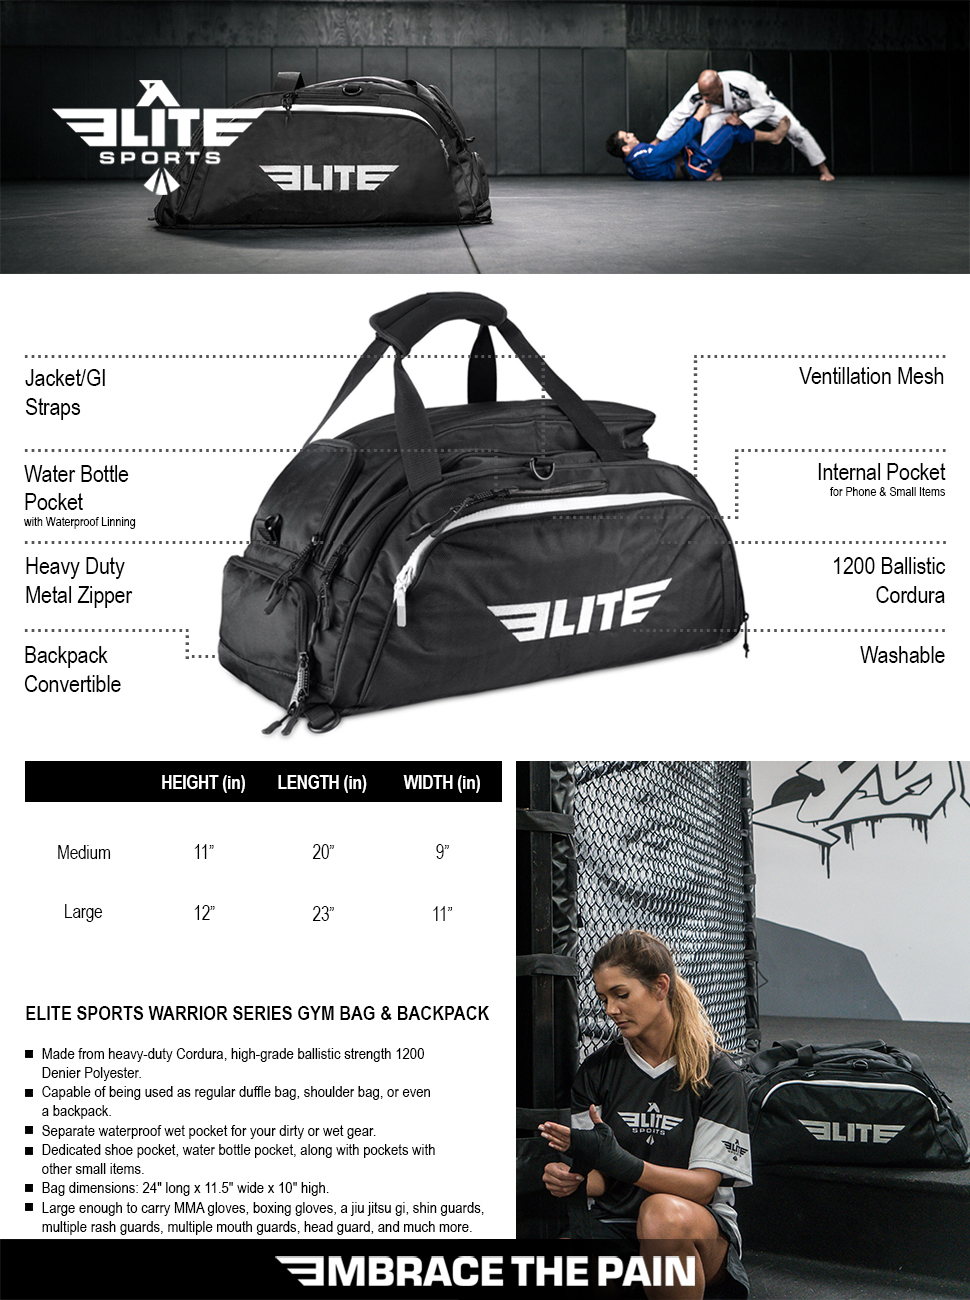 f93e2a8a0836 Elite Sports NEW ITEM Warrior Series Boxing MMA BJJ Gear Gym Duffel ...